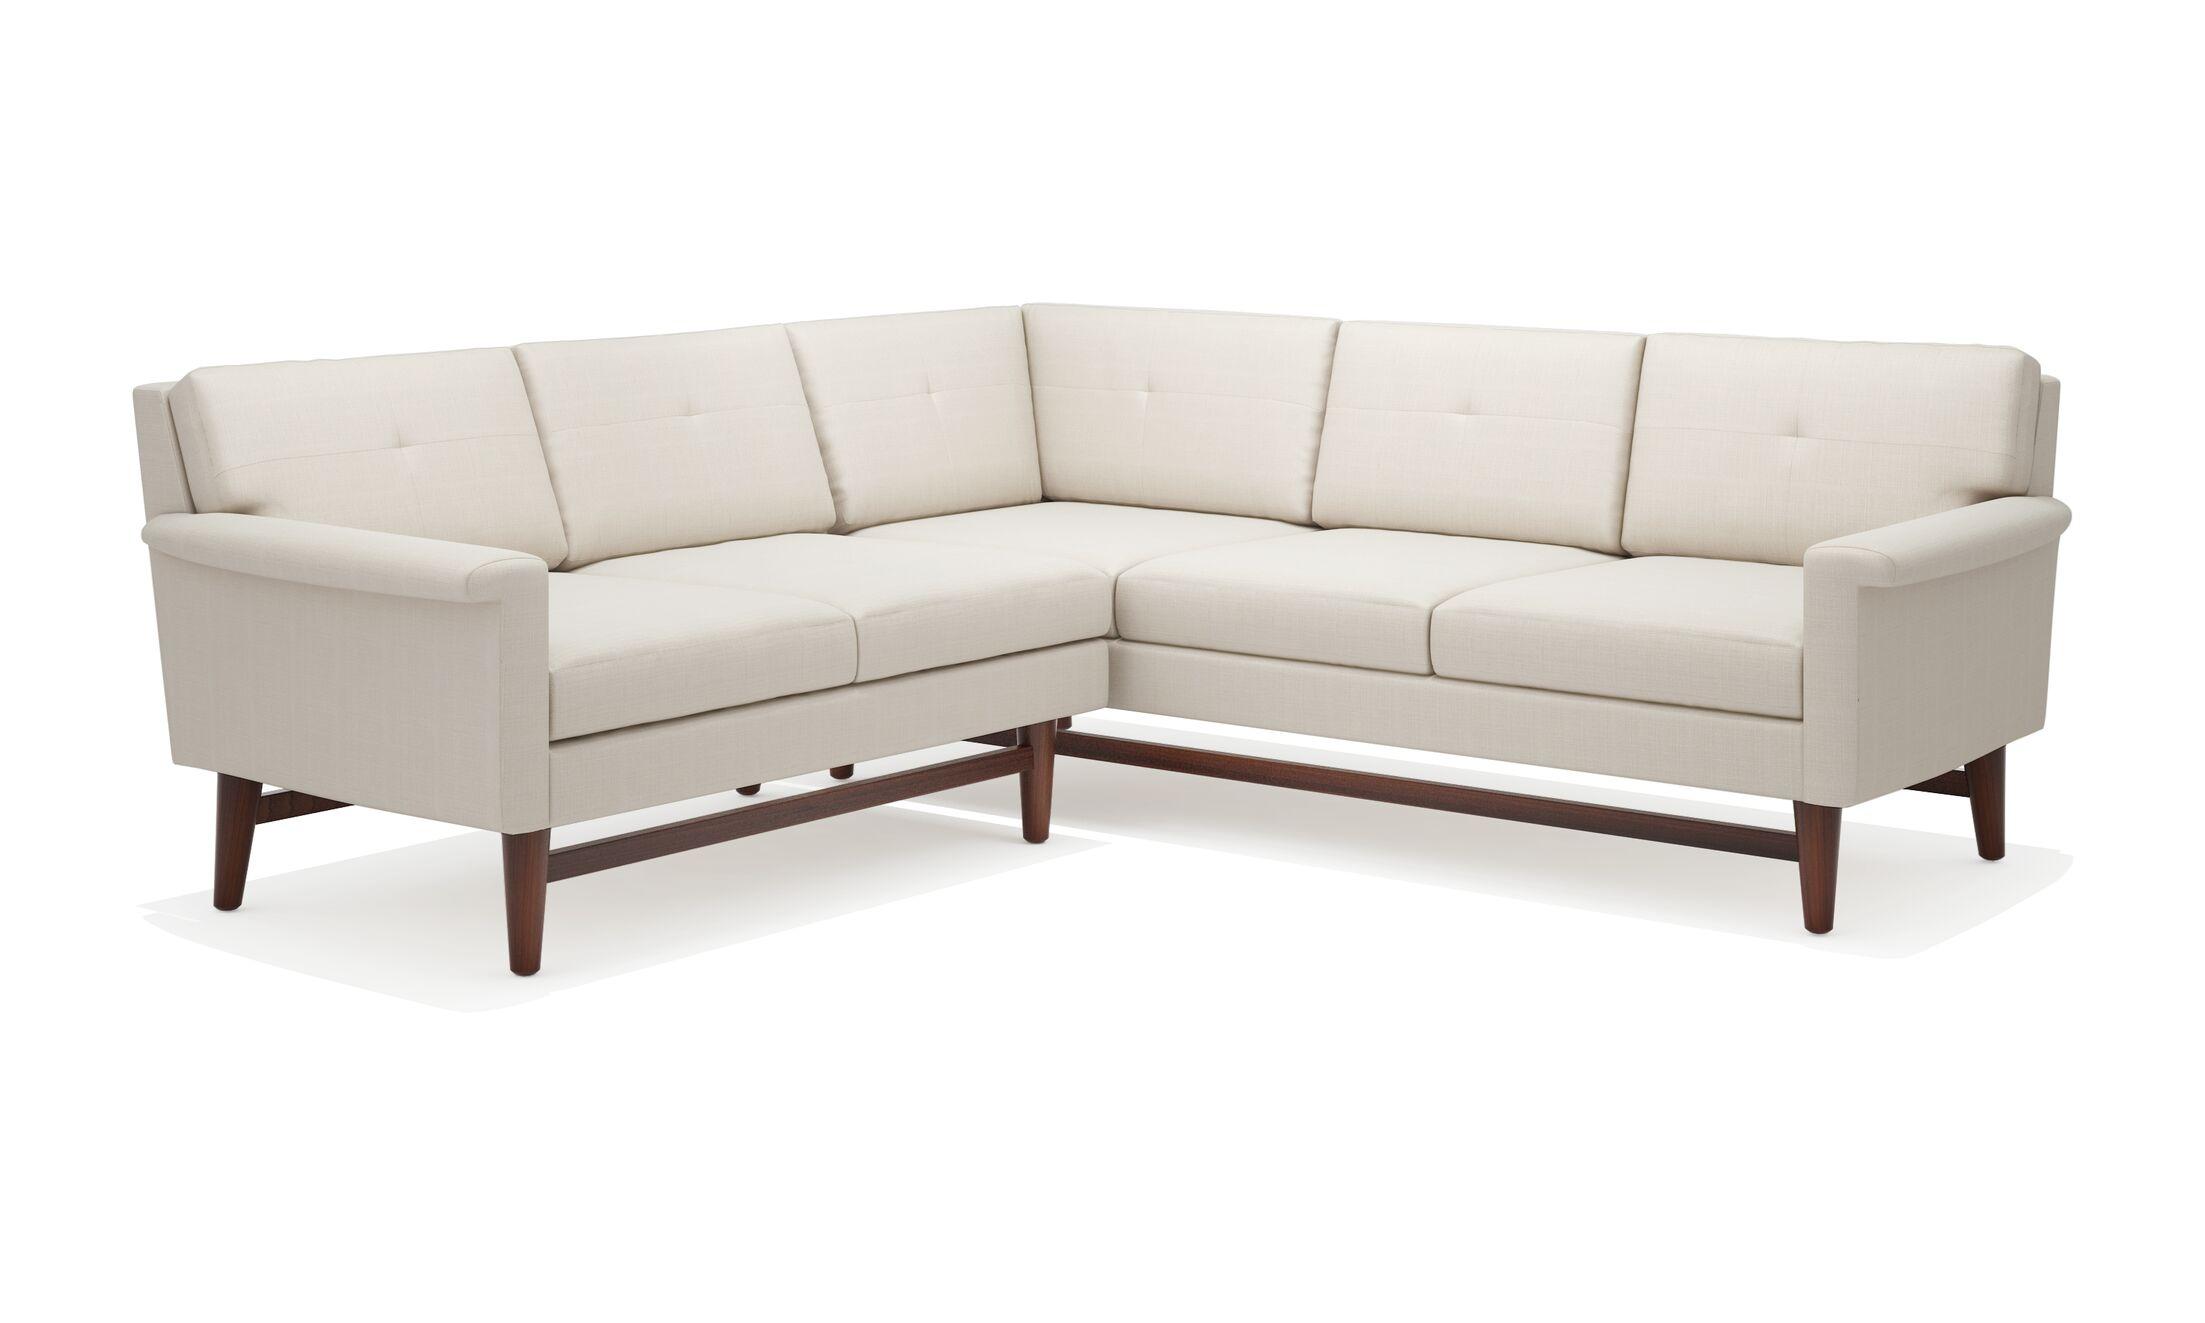 Diggity Corner Sectional Sofa Body Fabric: Klein Chocolate, Leg Color: Espresso, Sectional Orientation: Left Hand Facing